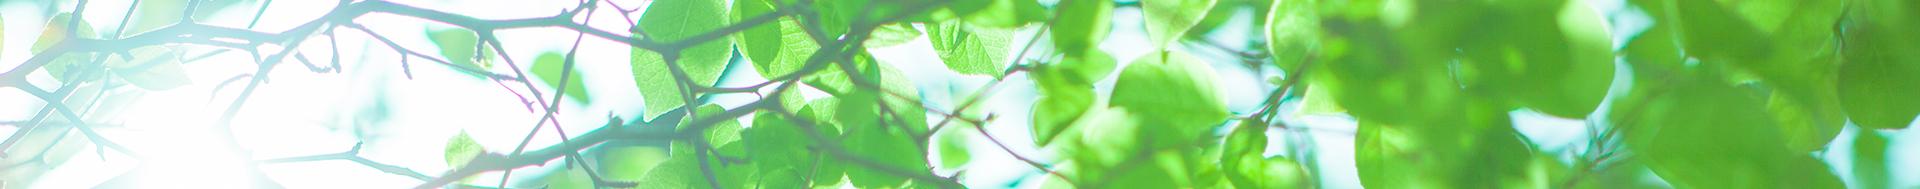 札幌・直葬5万・無宗教葬8万・家族葬14万・生活保護葬・実質負担0円~・小規模葬儀・福祉葬│アイシンセレモニー